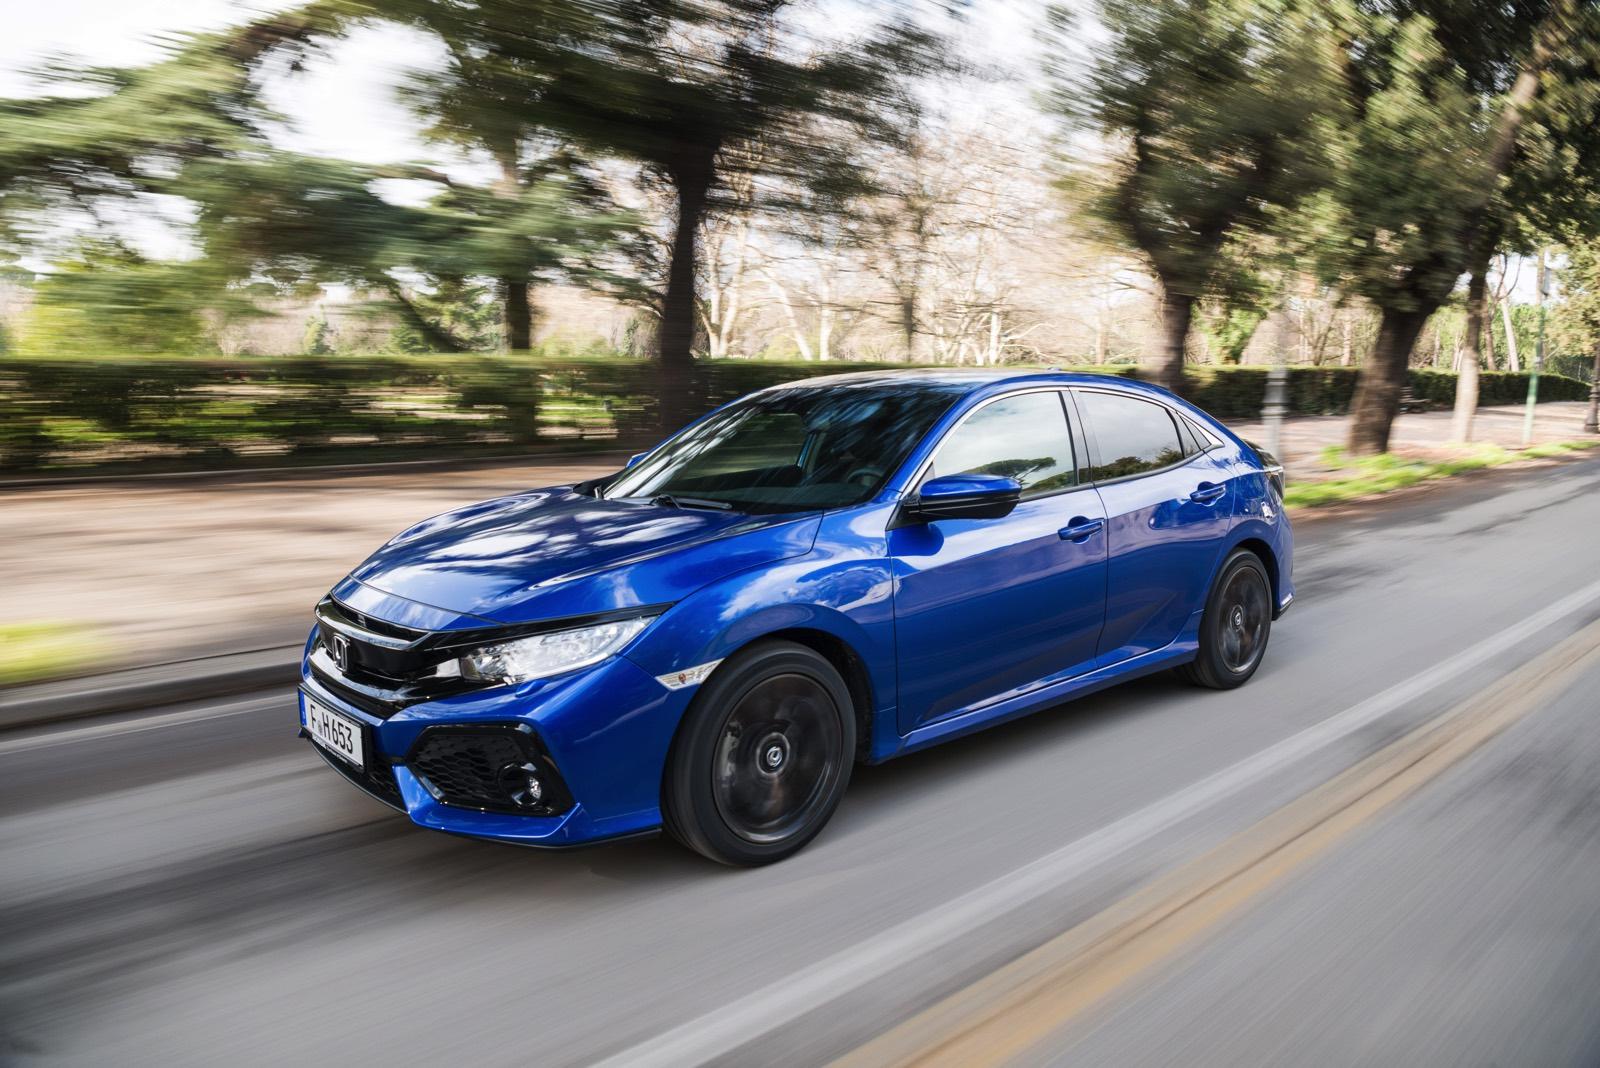 Honda Civic diésel 5 puertas